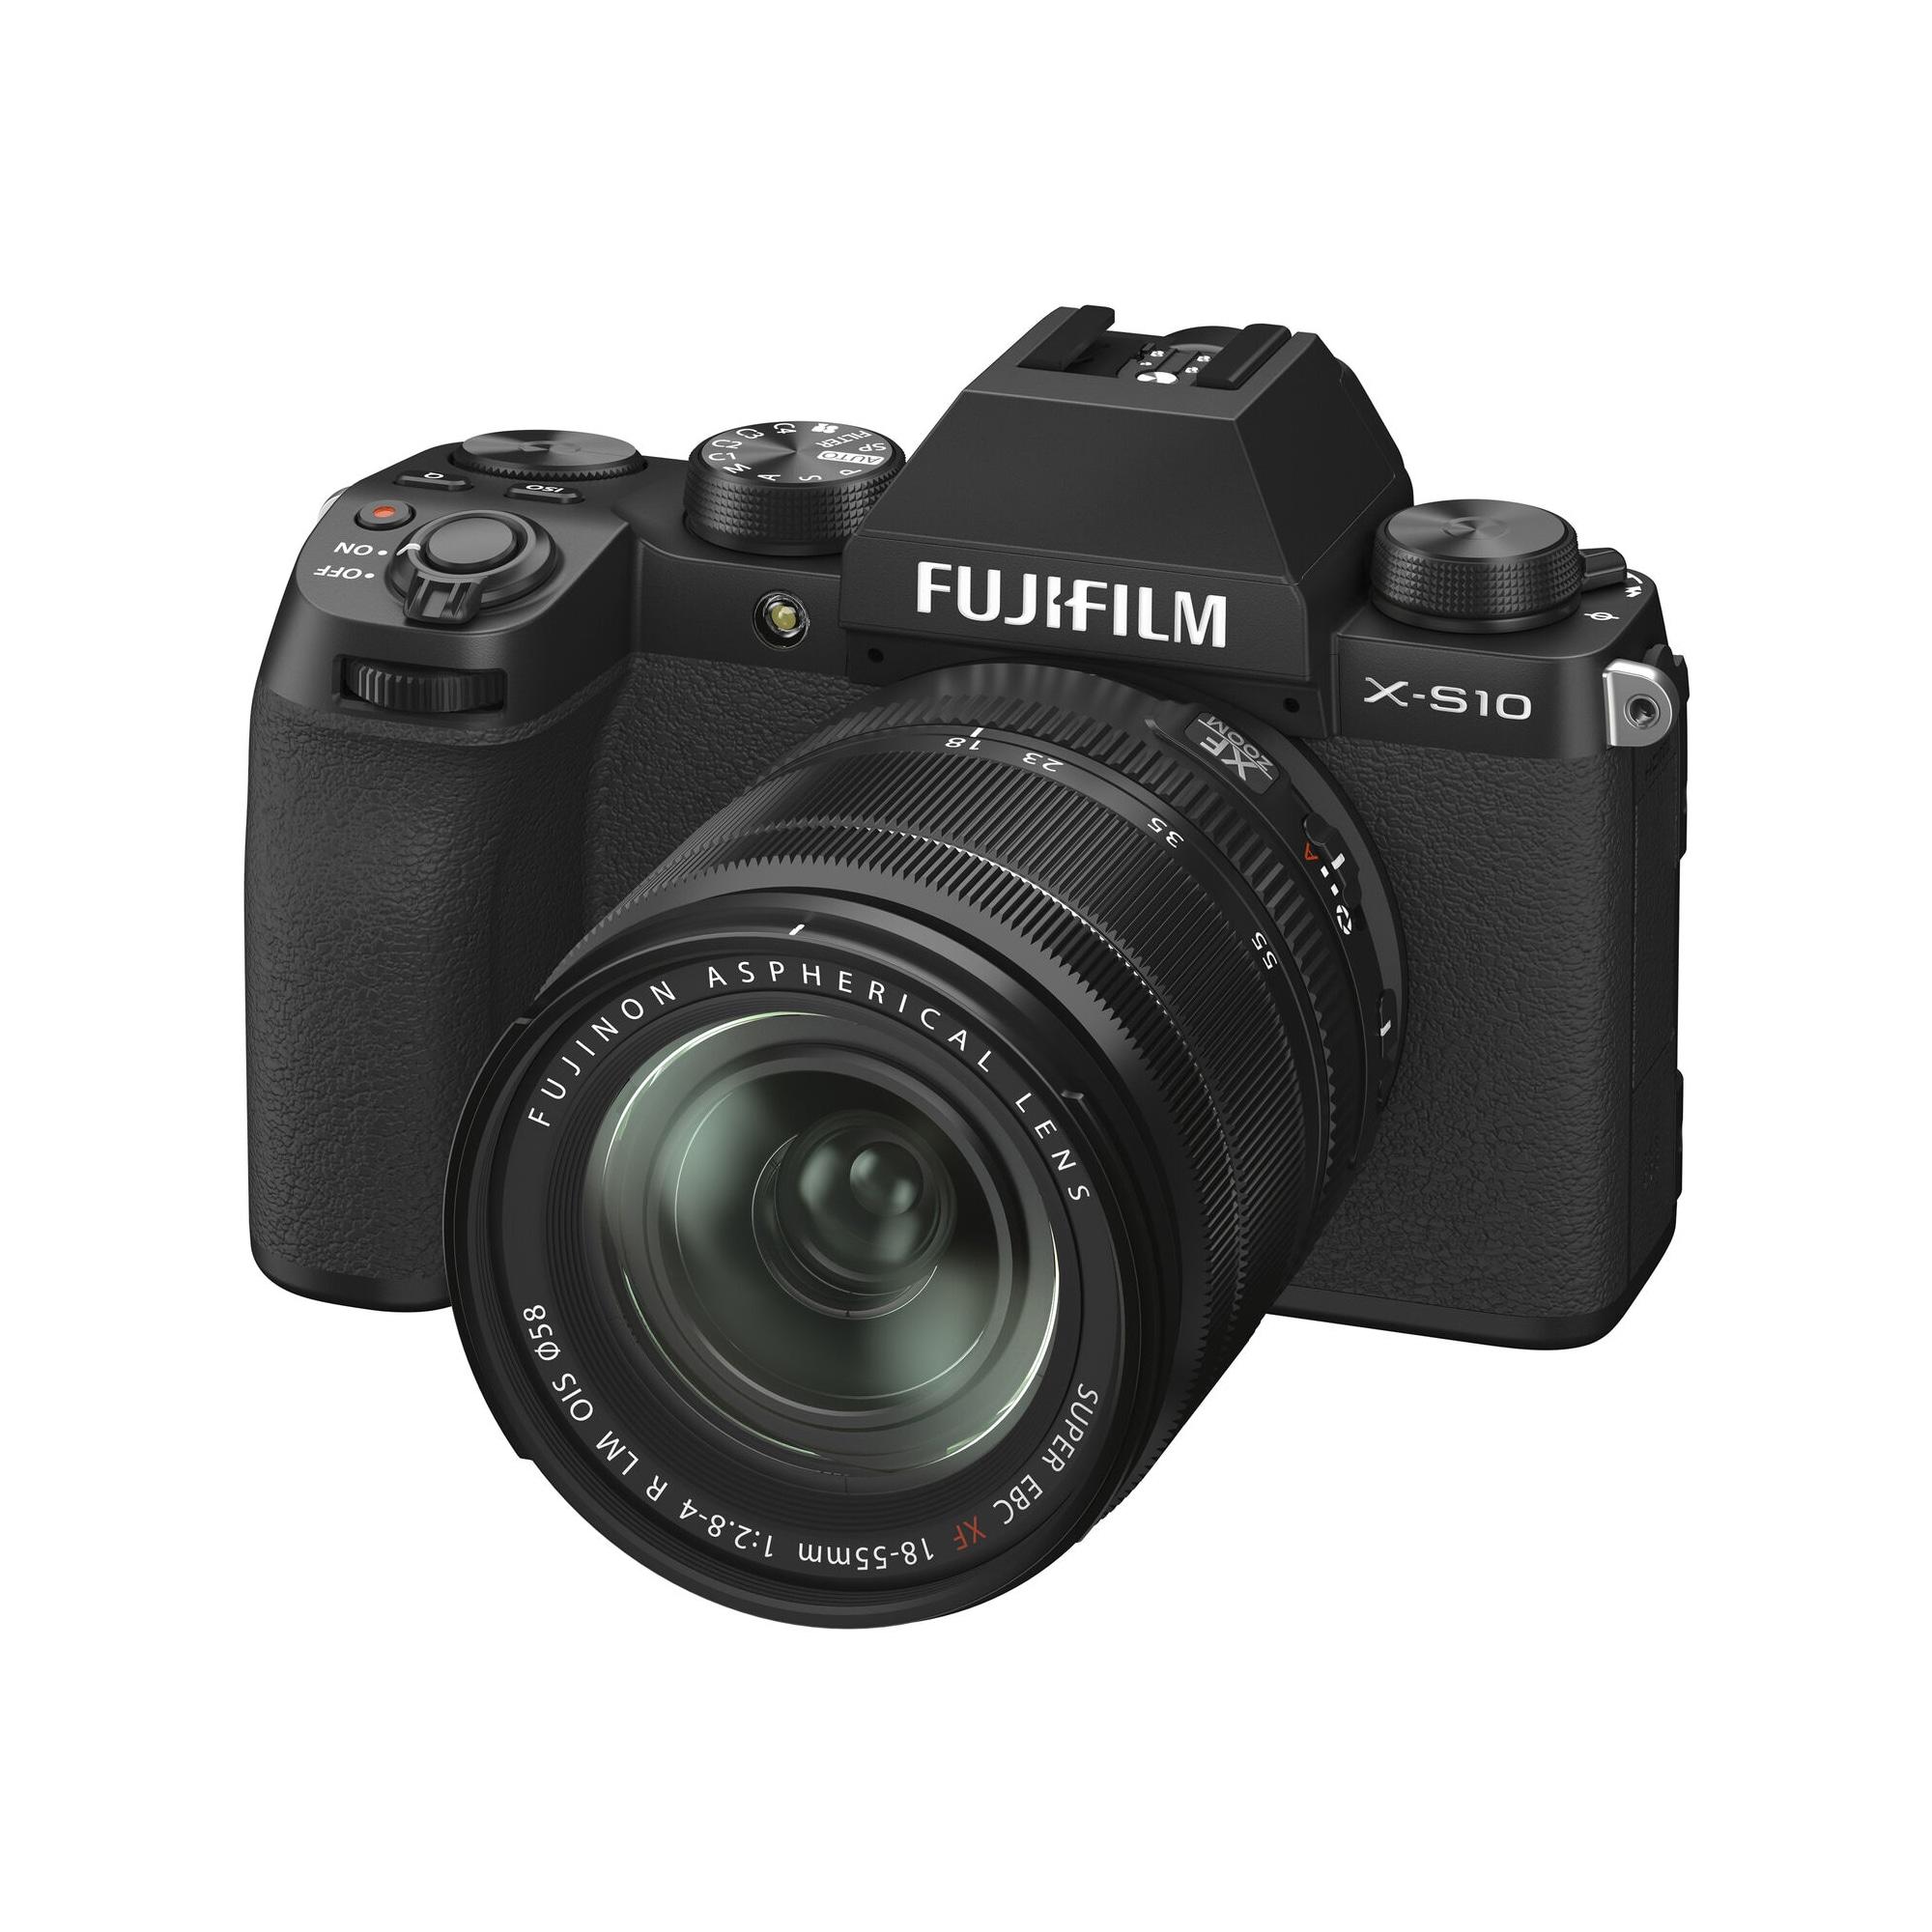 Fujifilm X-S10 + XF 18-55mm f/2.8-4 R LM OIS